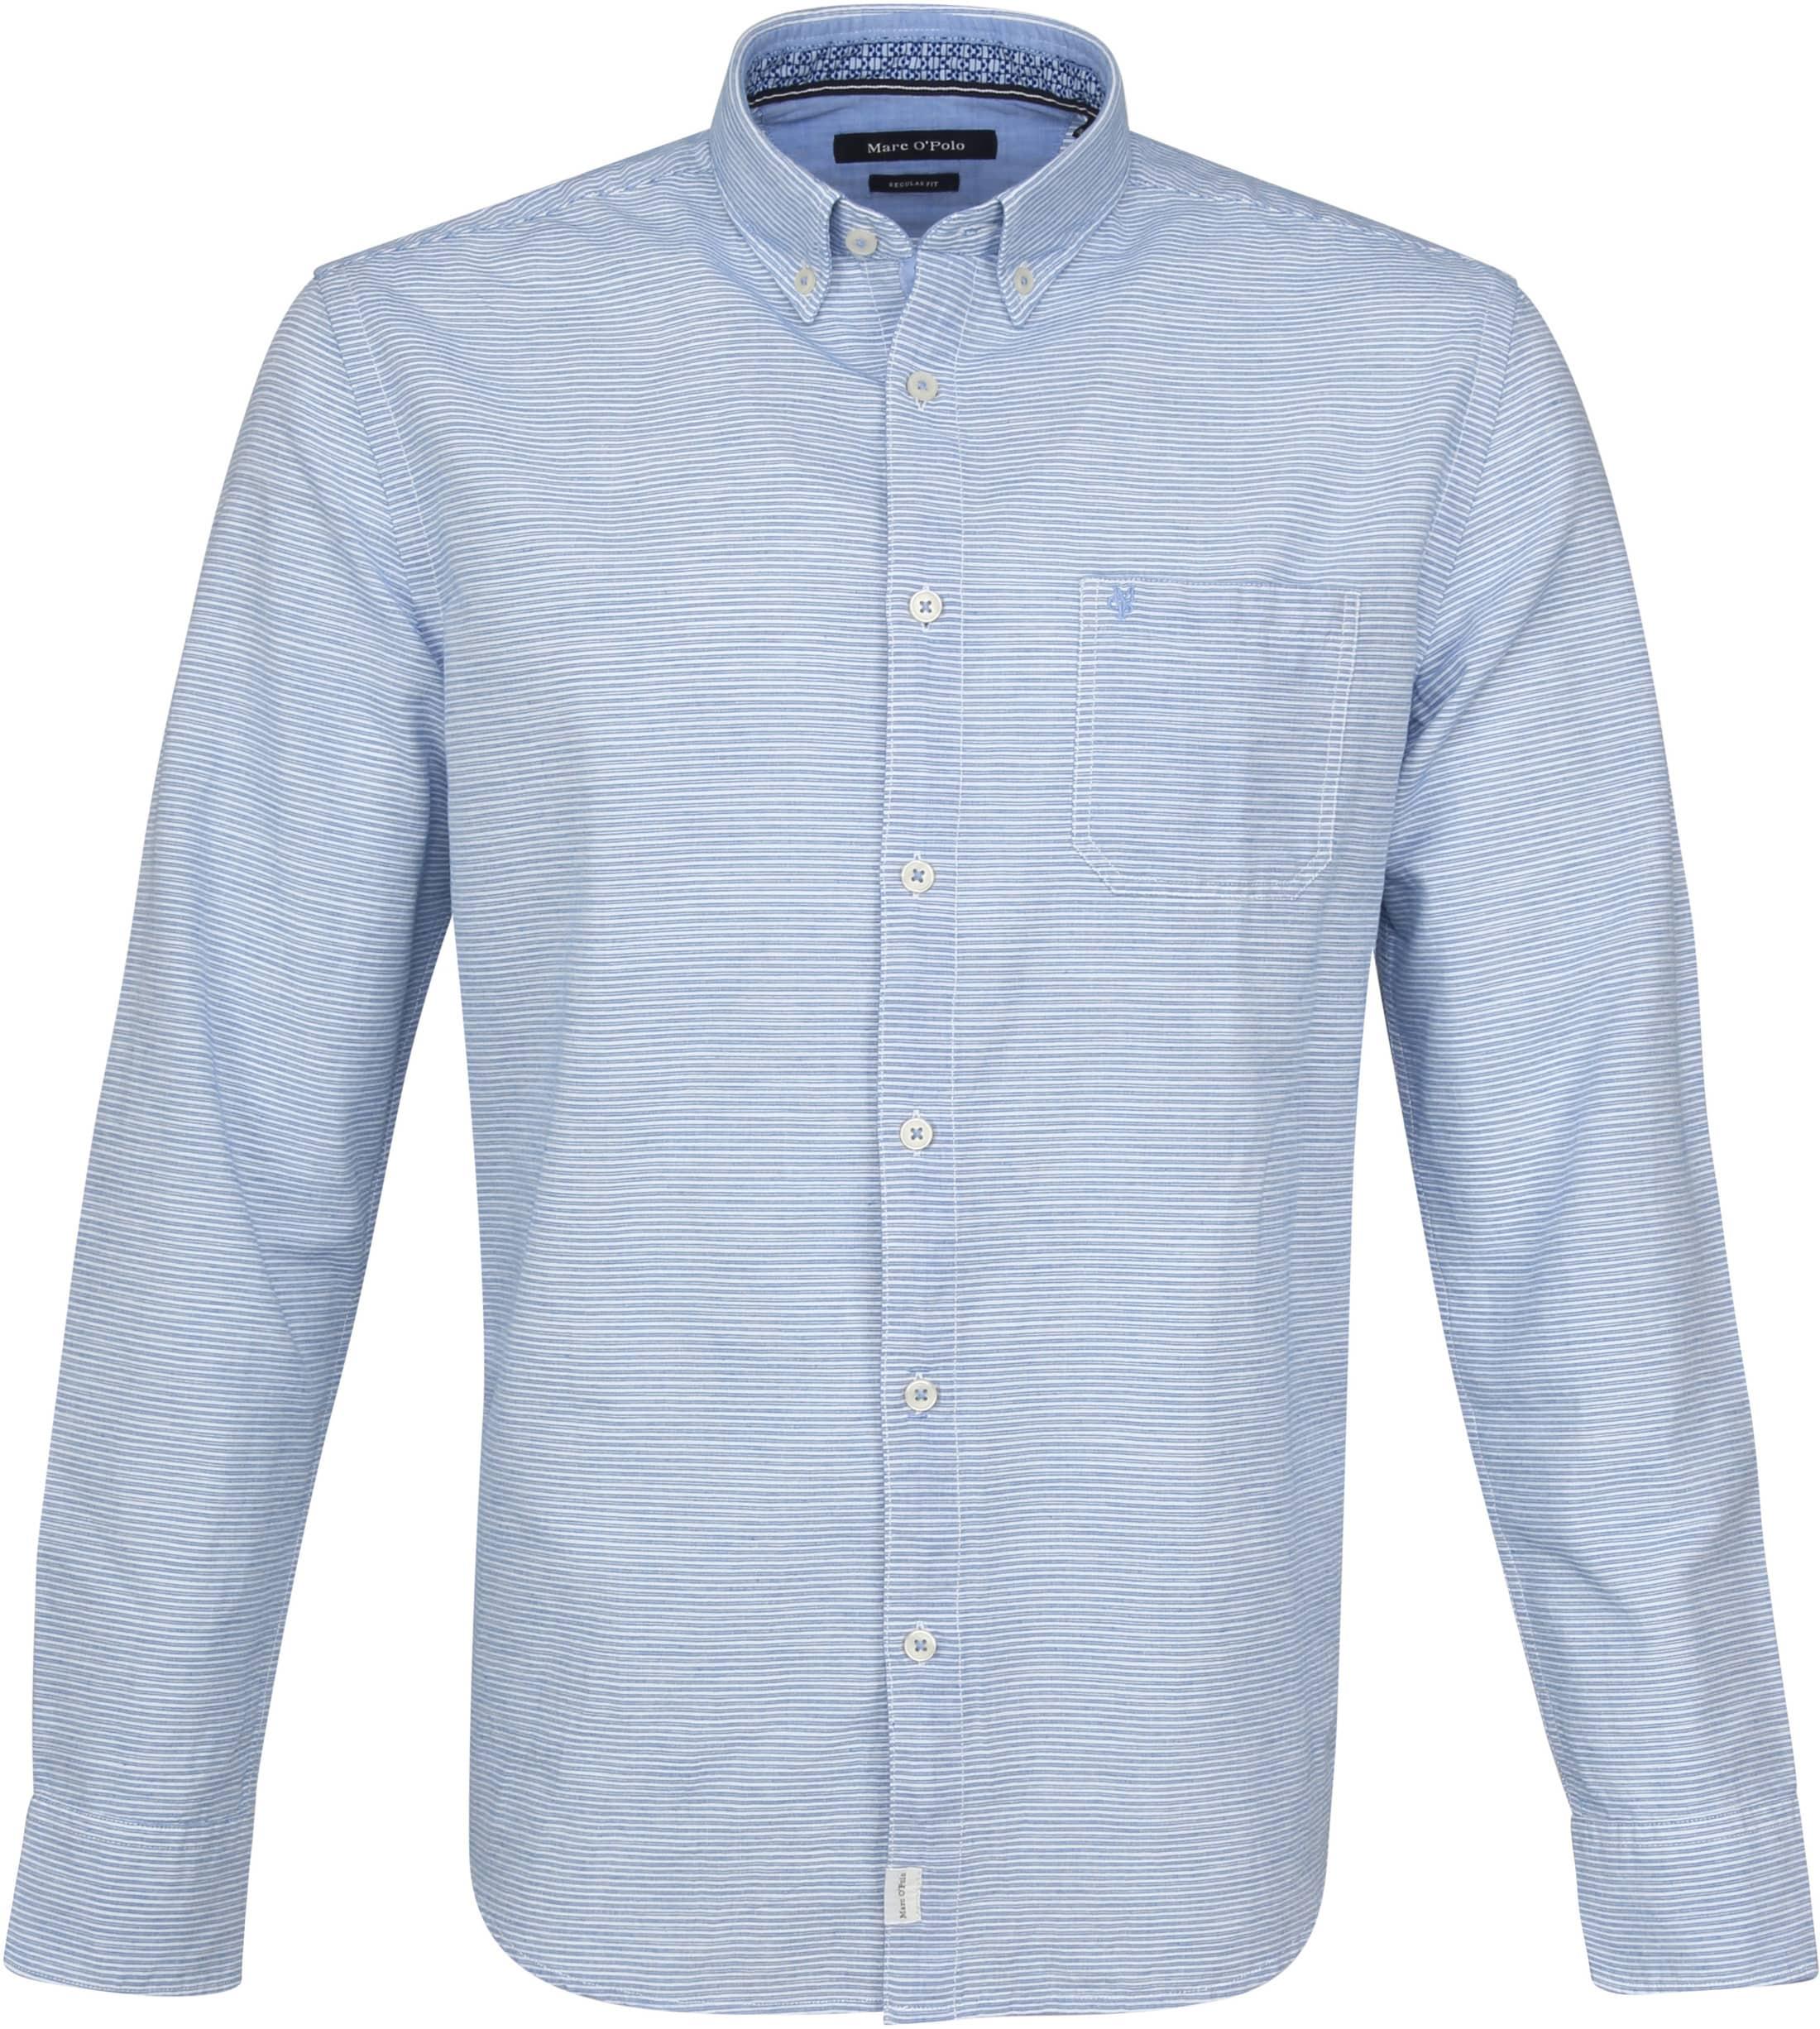 Marc O'Polo Hemd Casual streifen Blau 923733742338 online